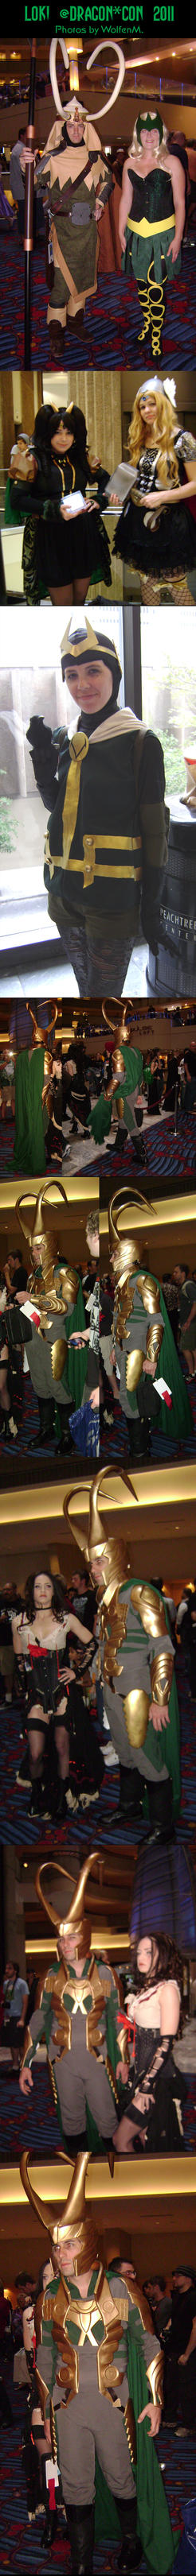 Loki at DragonCon 2011 by CanisCamera